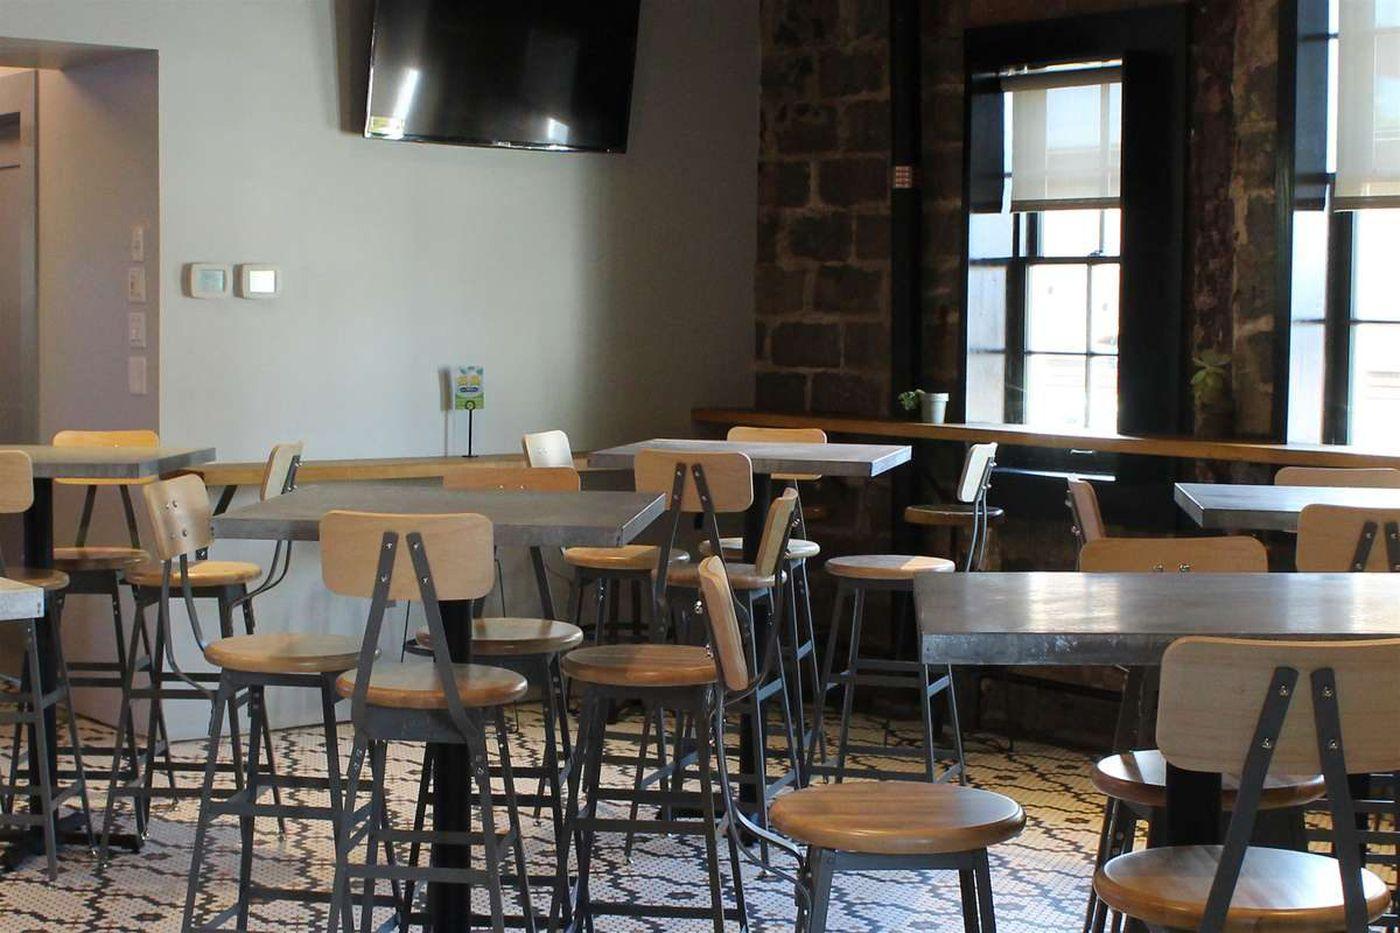 Bar Amis replaces Lo Spiedo at Navy Yard